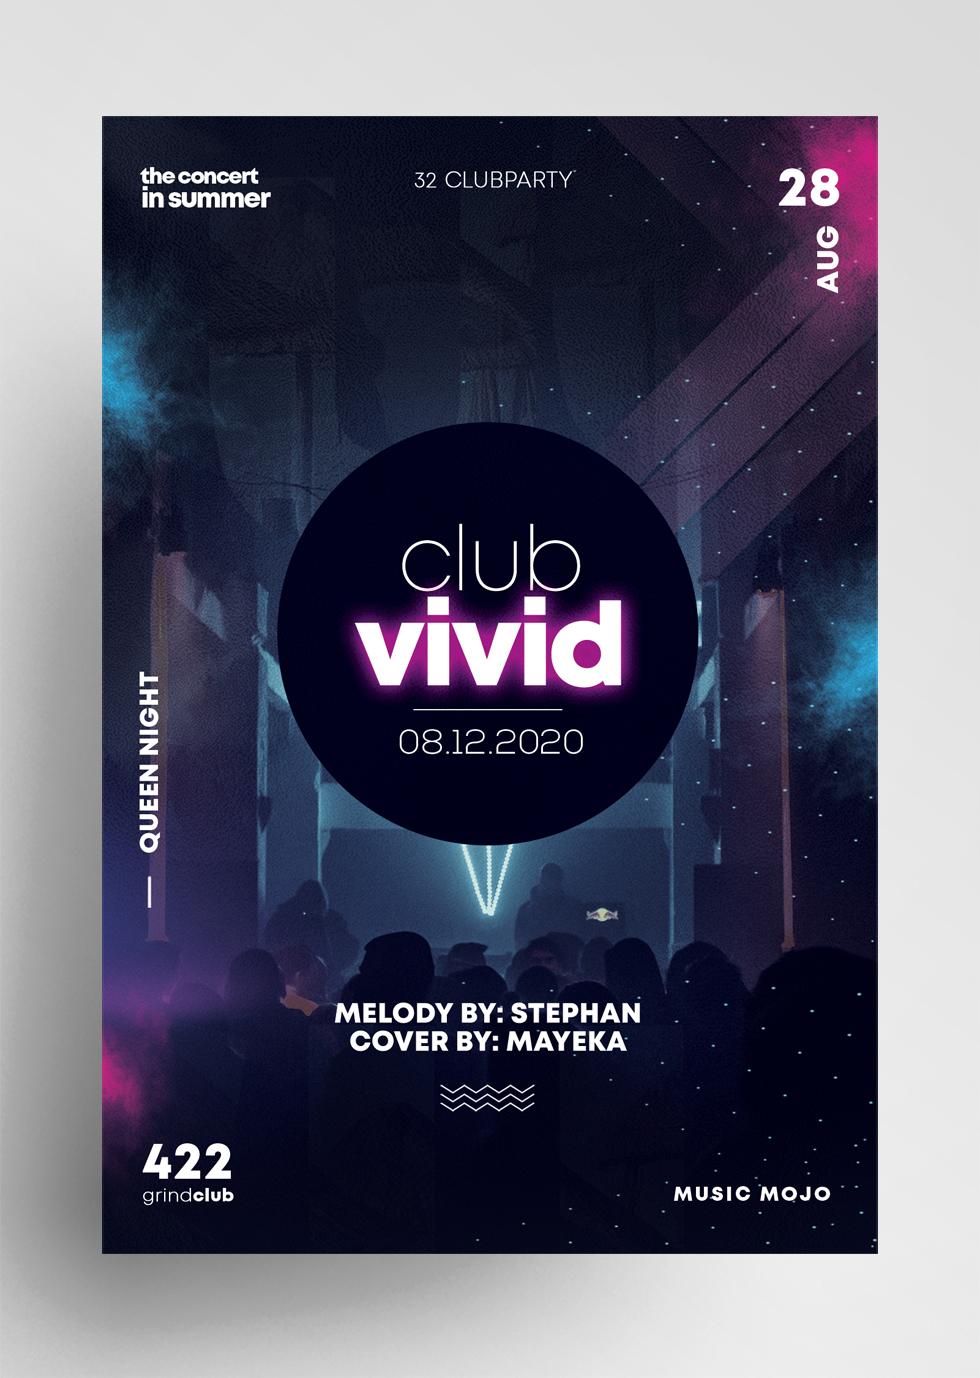 Club Vivid PSD Free Flyer Template vol2